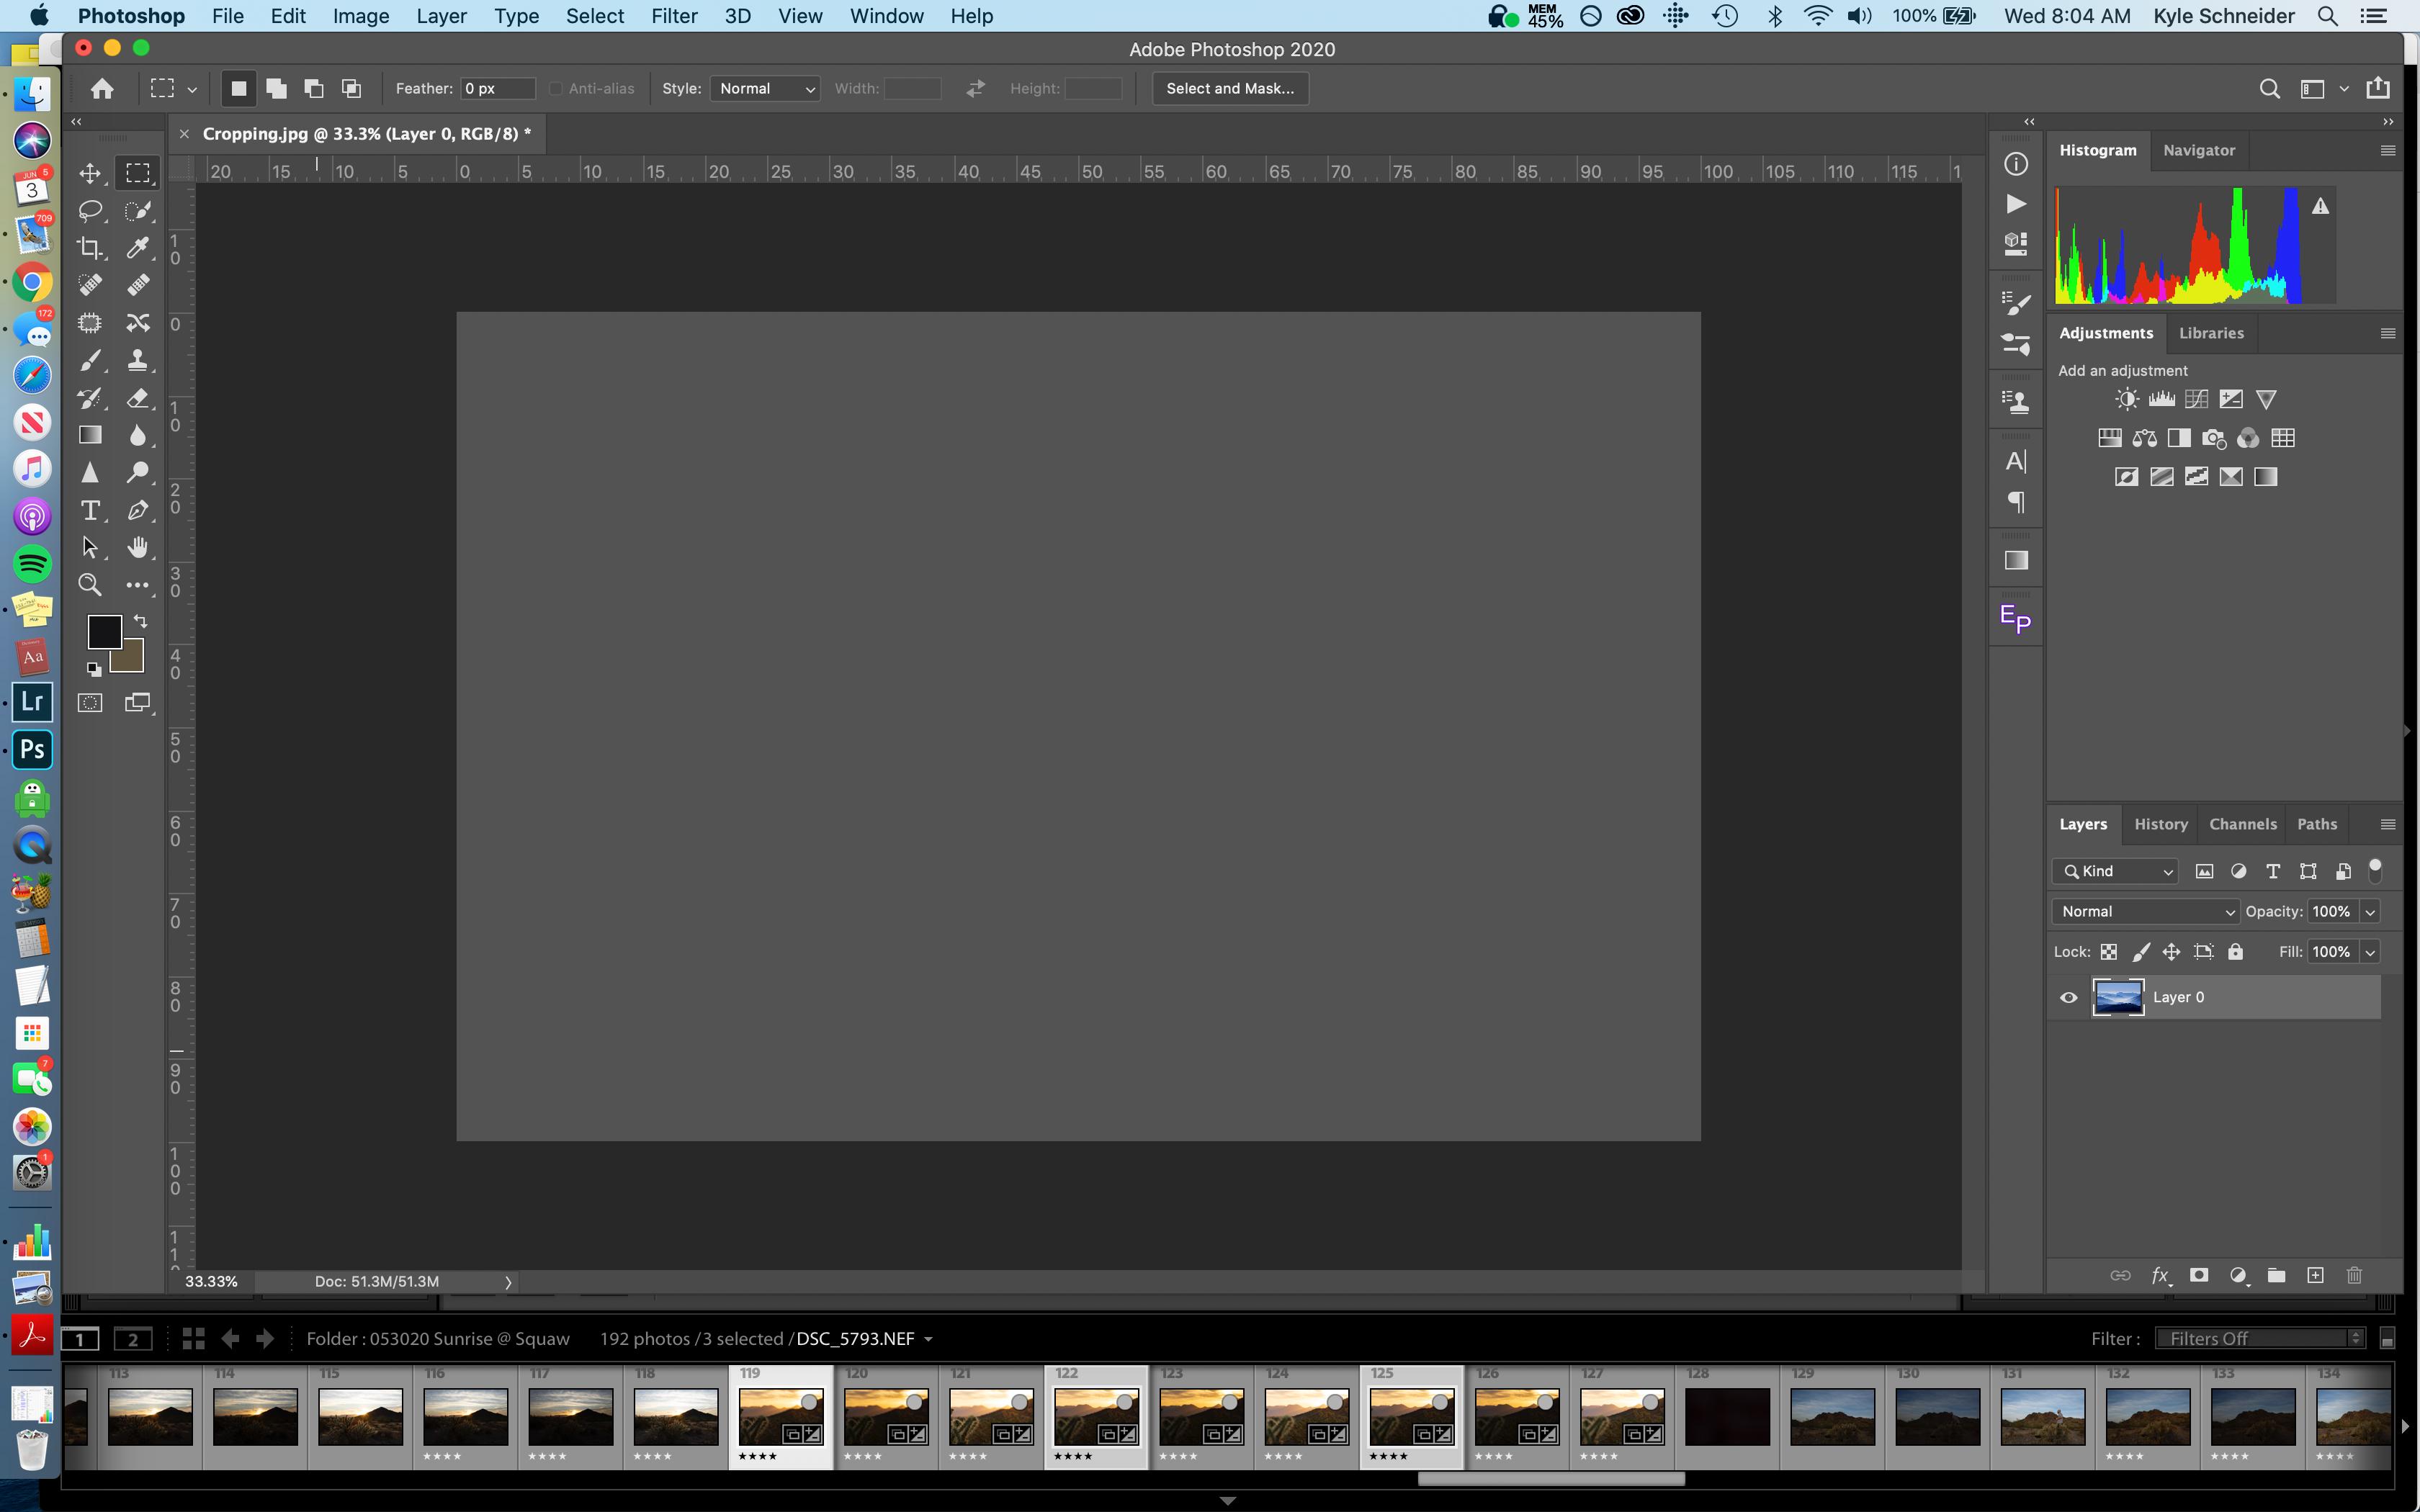 Adobe Photoshop Software - 4